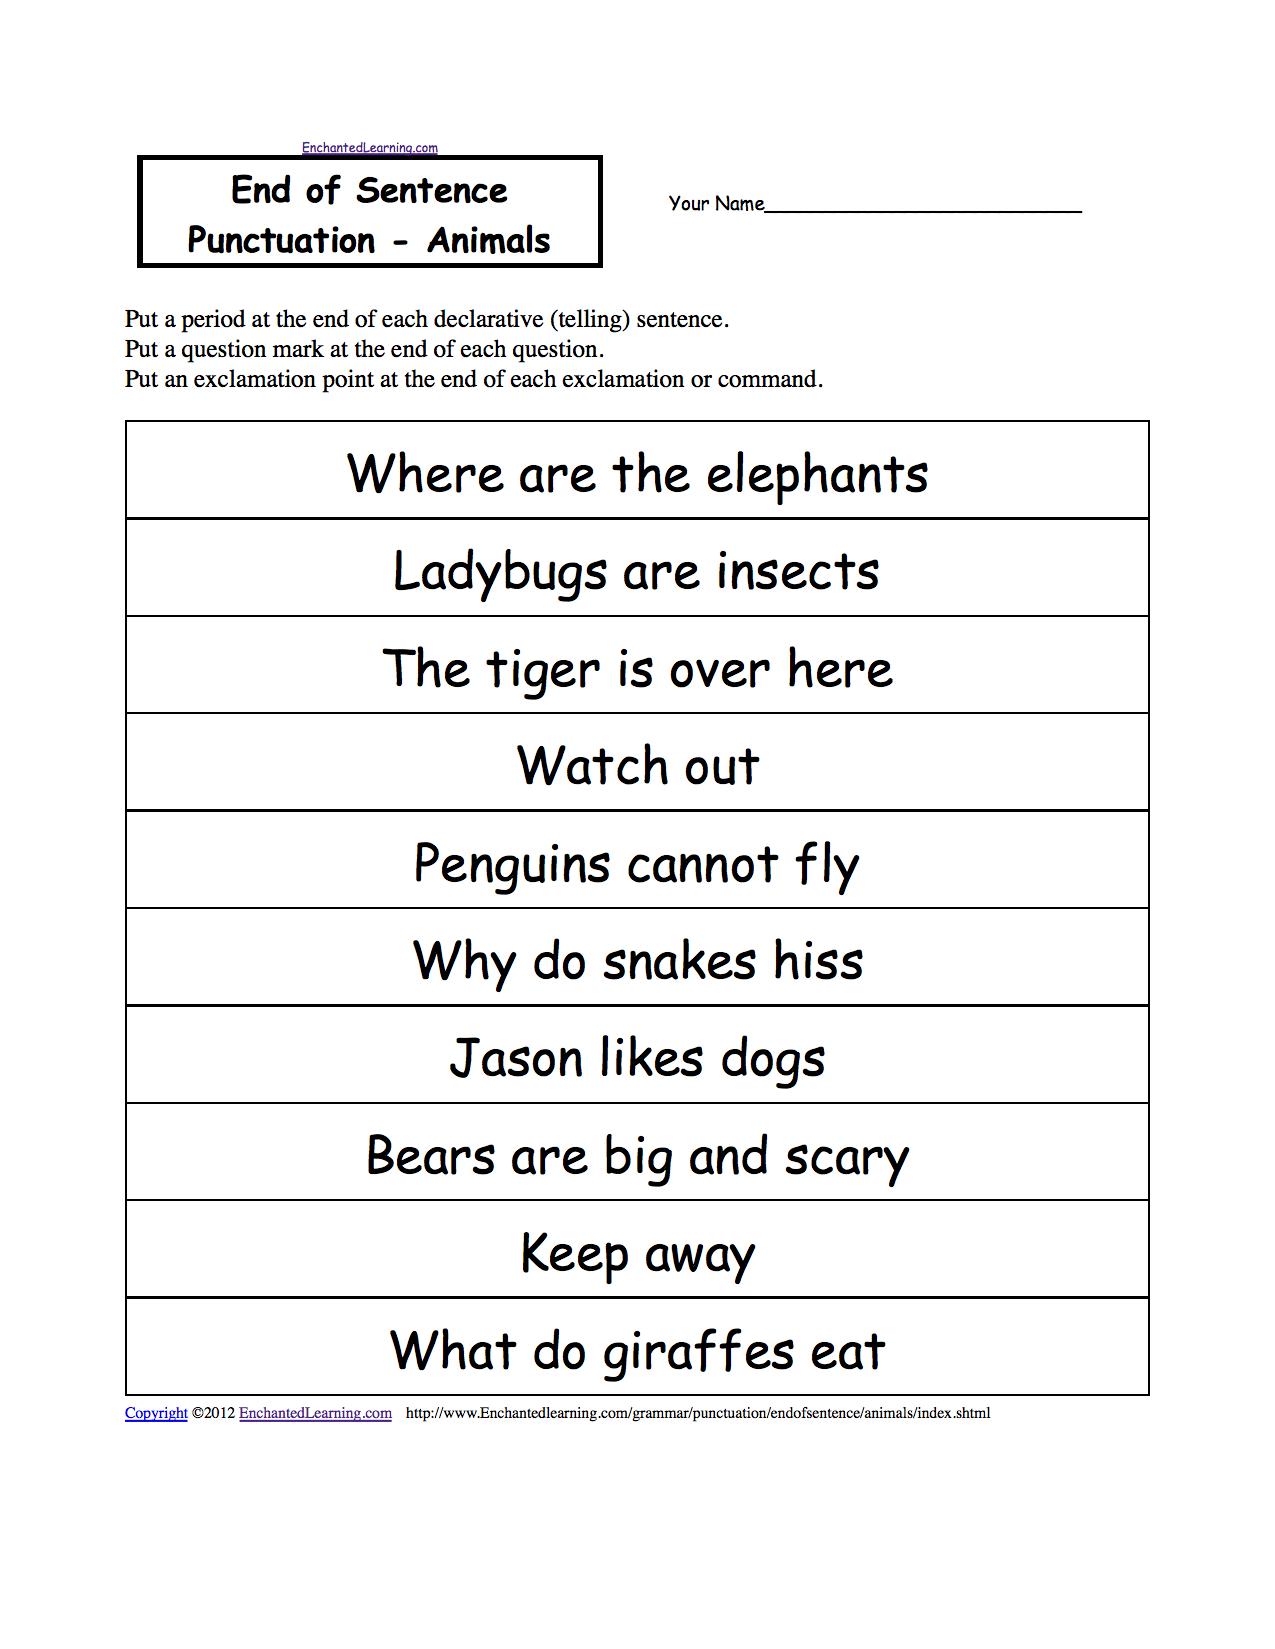 Image Result For Declarative Sentences About Animals Punctuation Worksheets Worksheets For Kids Punctuation [ 1649 x 1275 Pixel ]